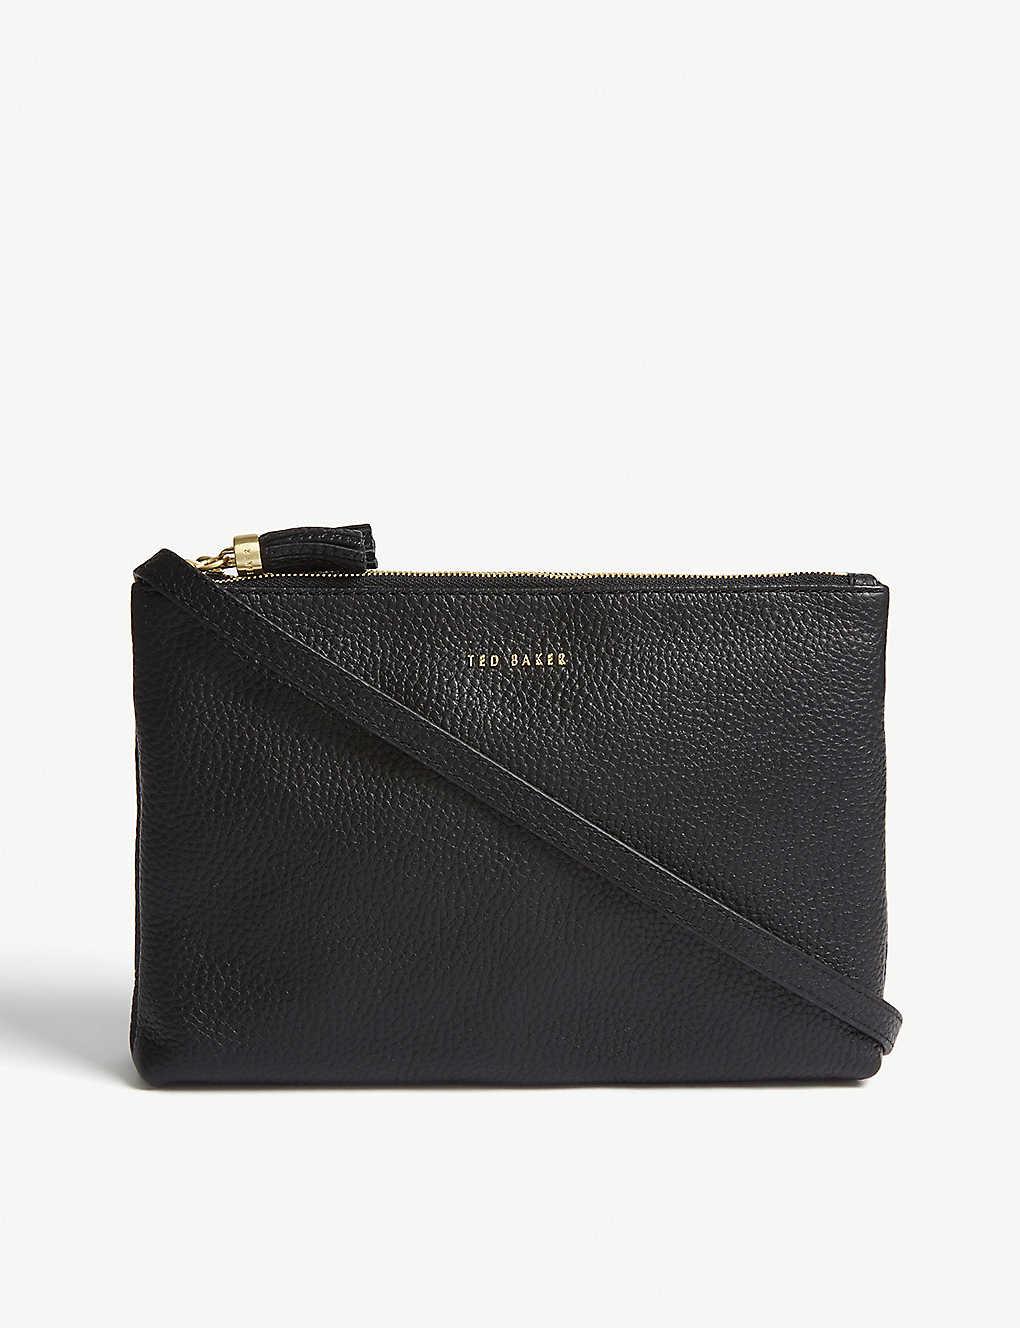 bcd4a1ec1 TED BAKER - Maceyy leather cross-body bag